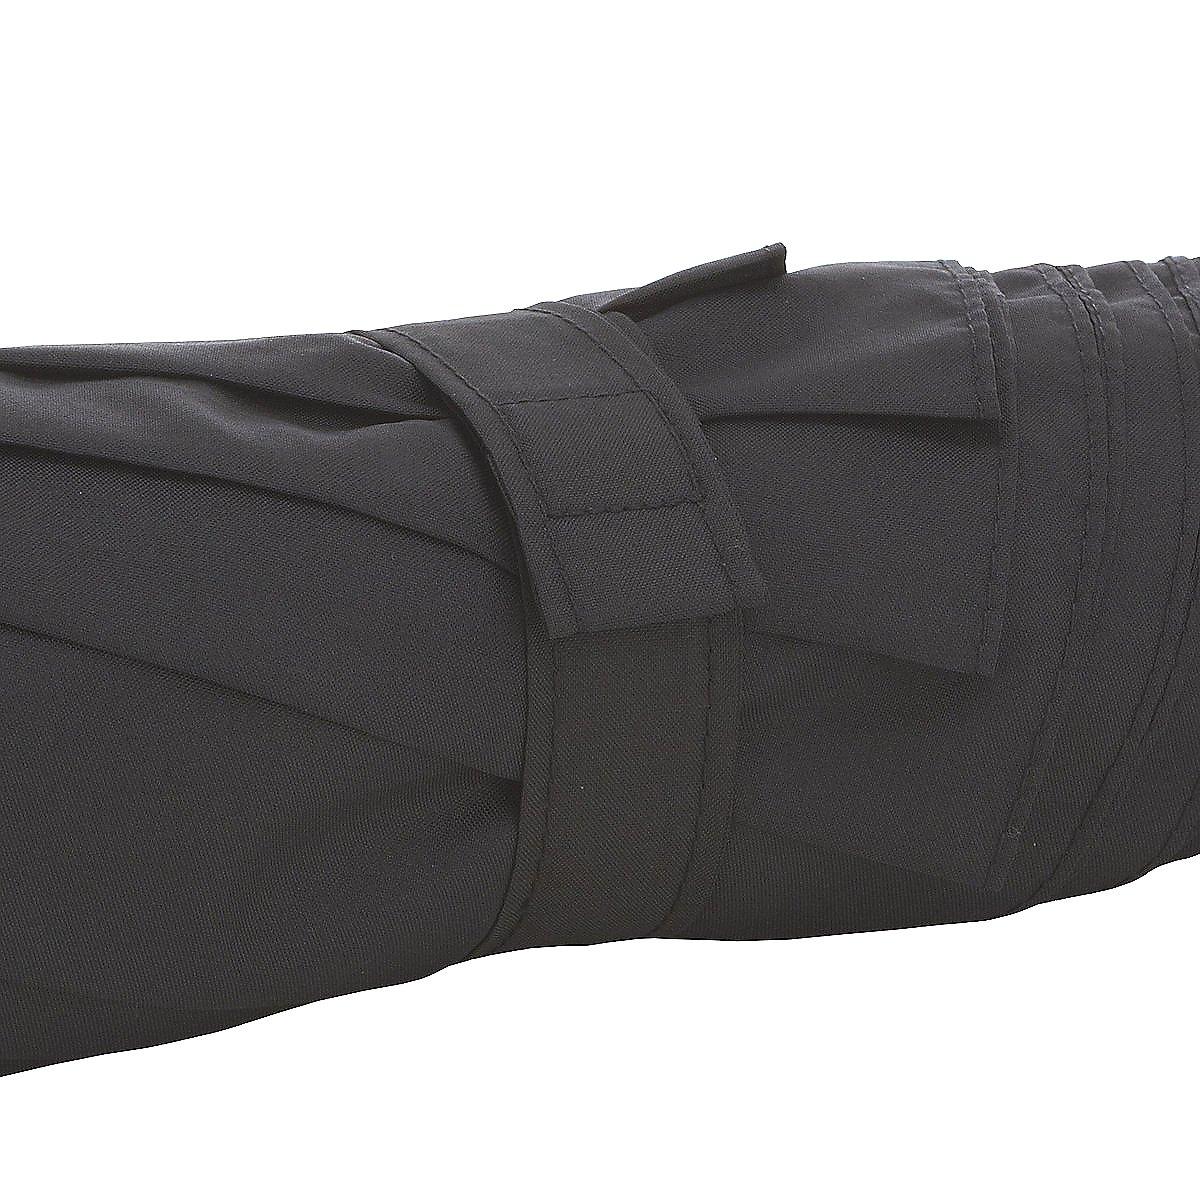 samsonite umbrella alu drop regenschirm auto koffer. Black Bedroom Furniture Sets. Home Design Ideas